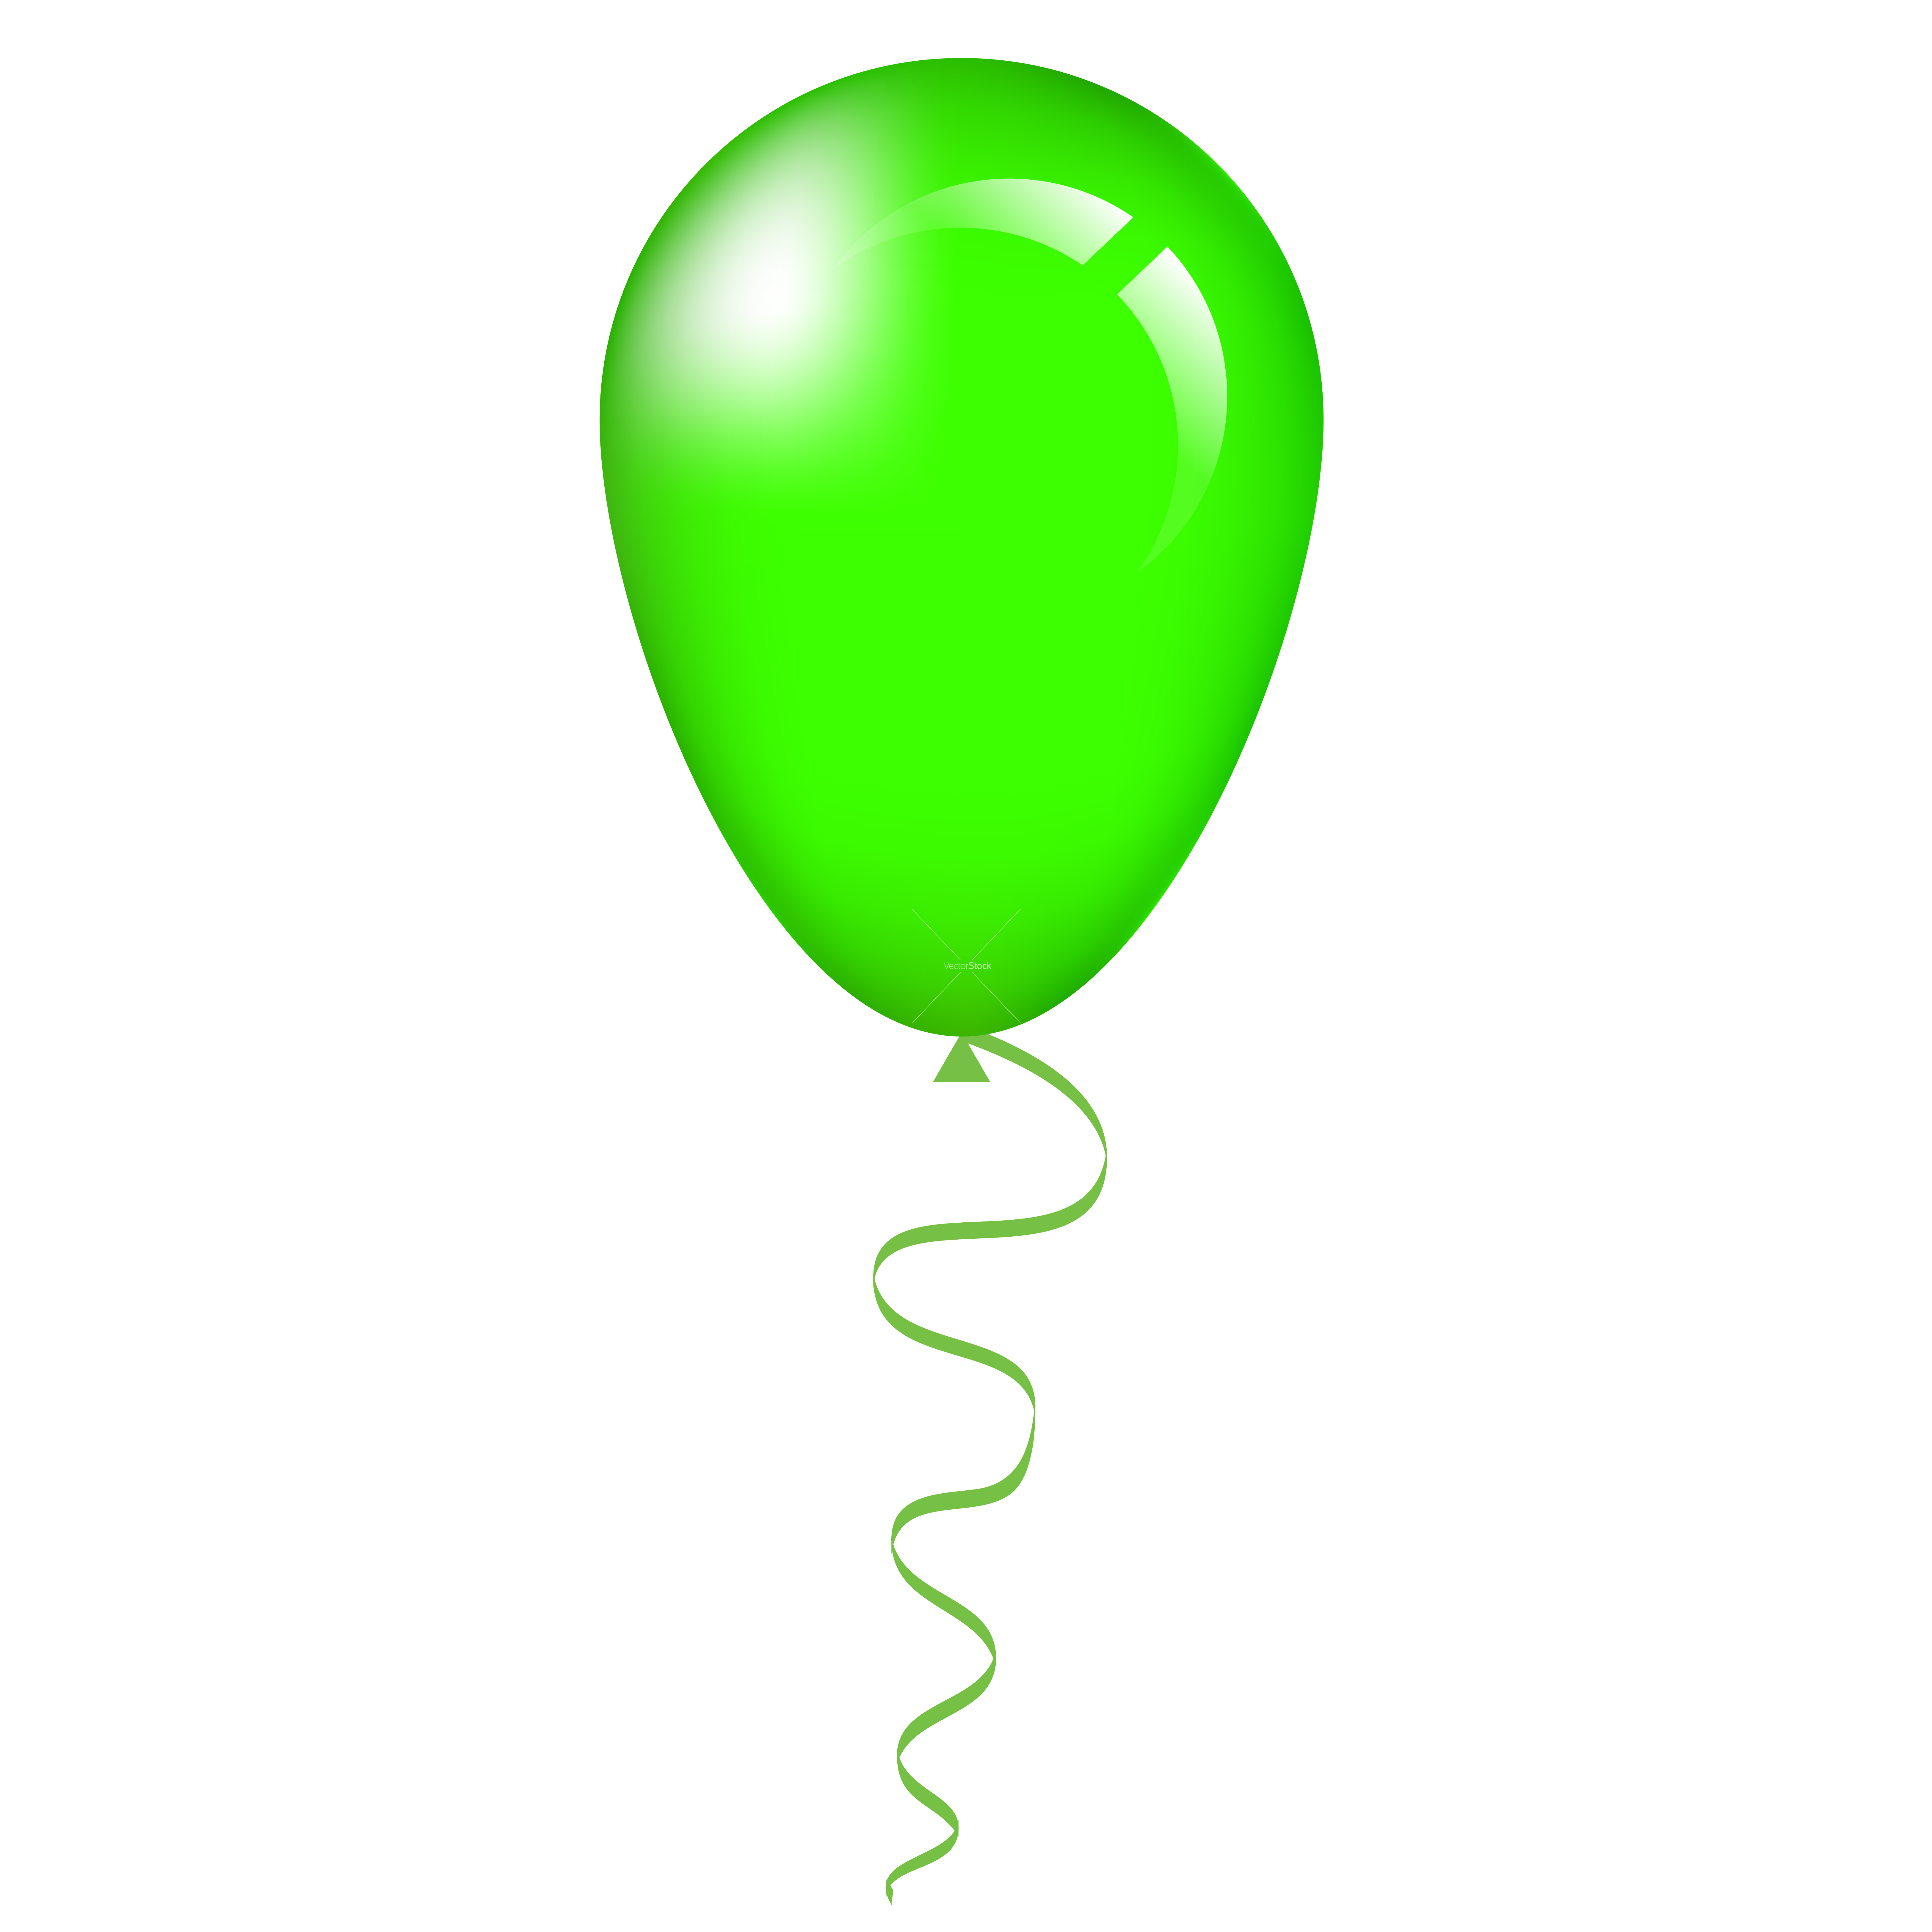 6496x6496 Green Balloon Clipart